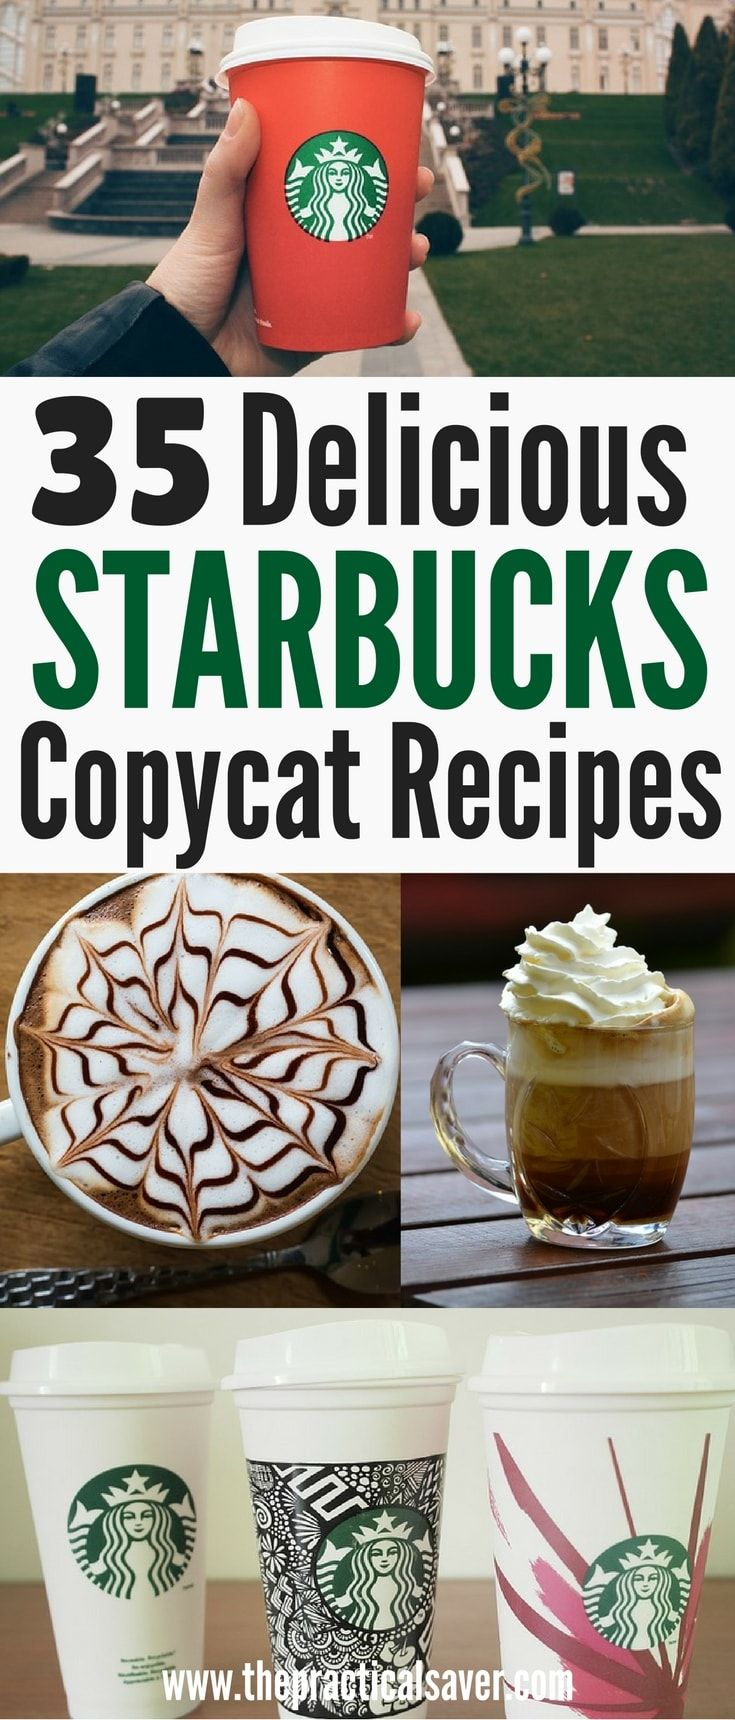 35 Delicious Starbucks Copycat Recipes Starbucks recipes